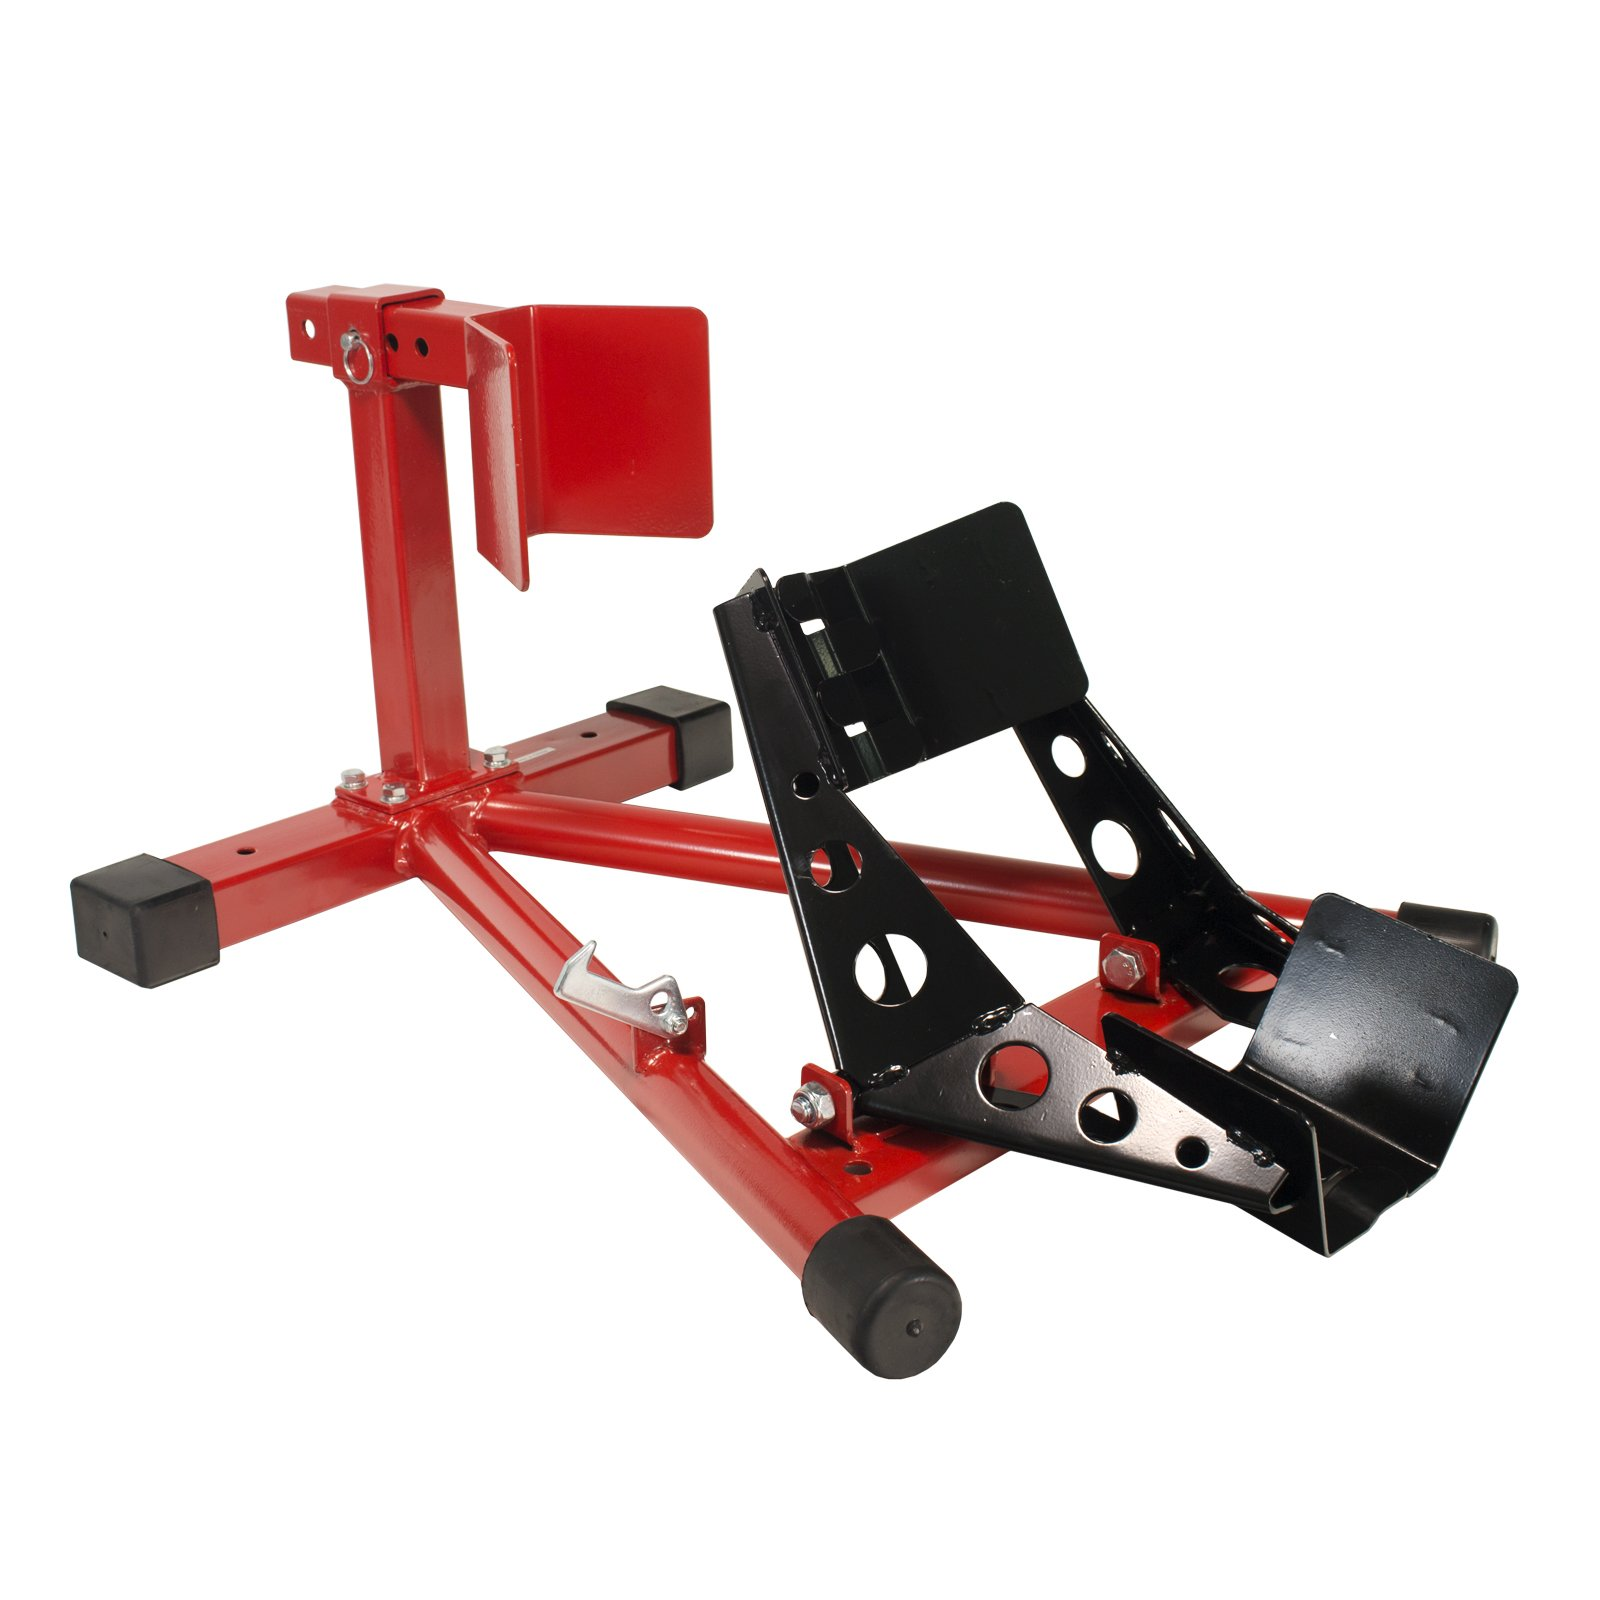 Dragway Tools Motorcycle Wheel Chock Locking & Adjusting Stand 16'' - 21'' Tire by Dragway Tools